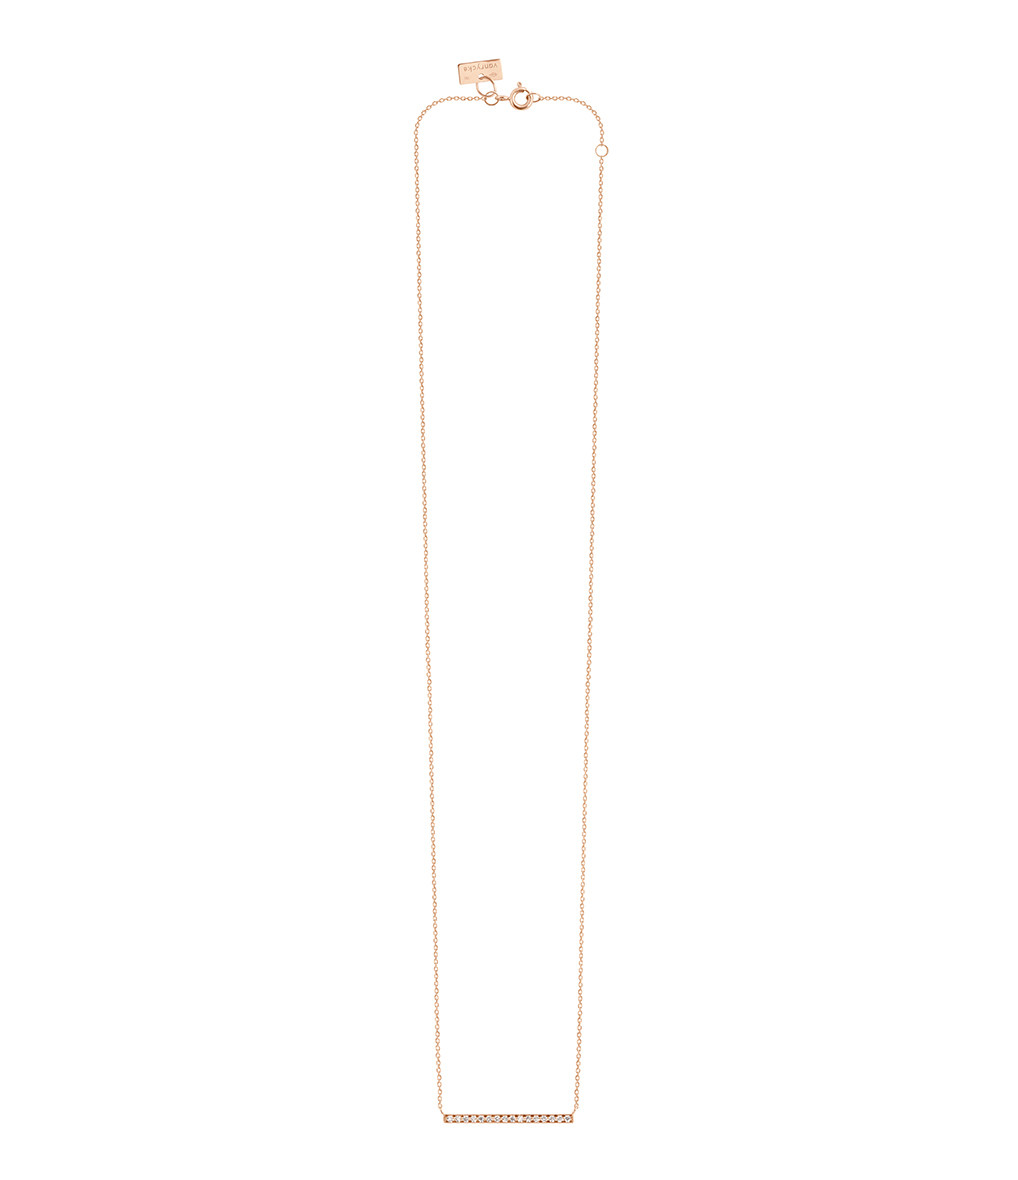 VANRYCKE - Collier Medellin GM Or Rose Diamants